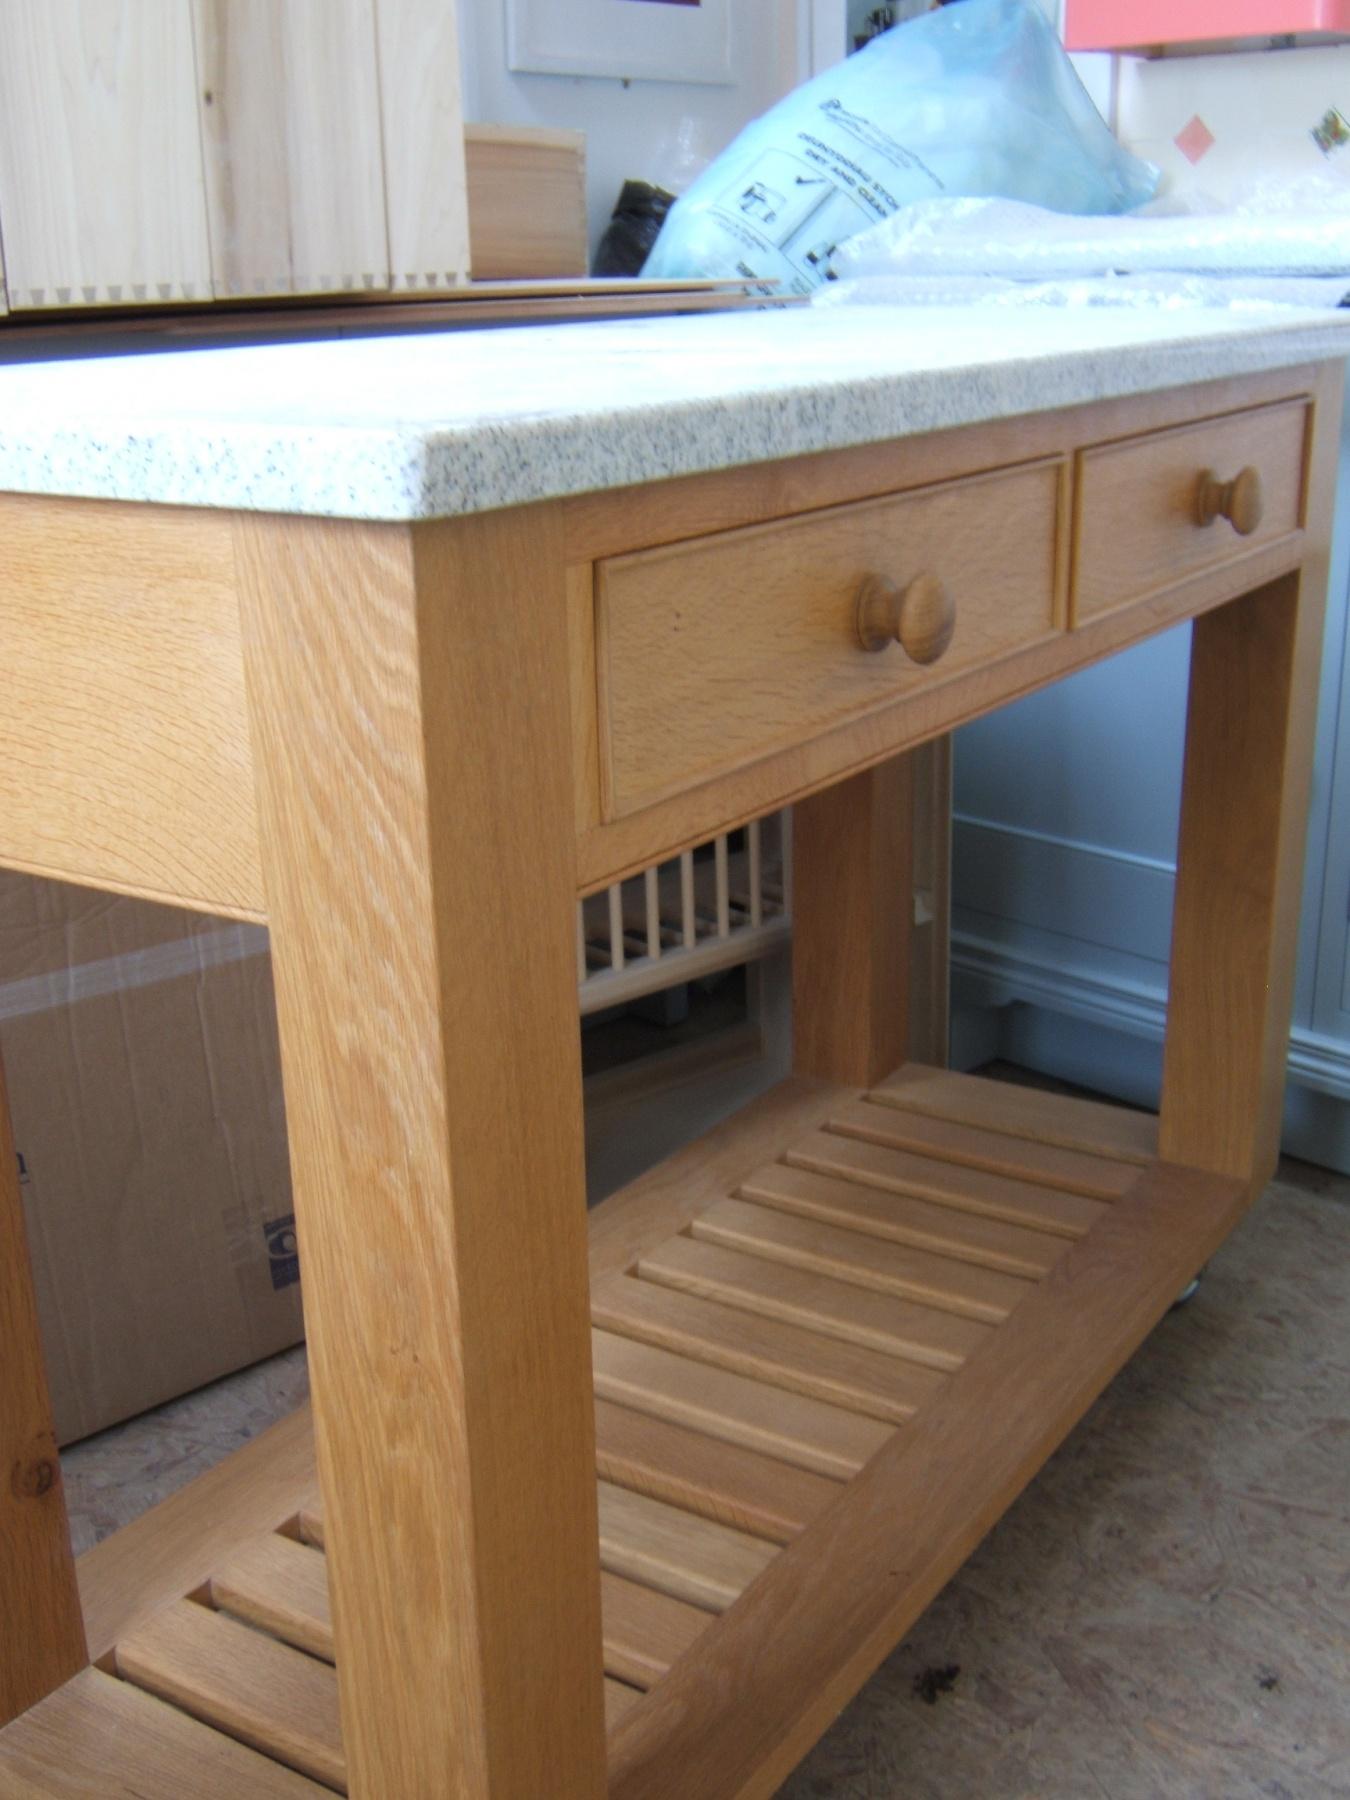 wood kitchen islands shelves ideas best island on casters homesfeed